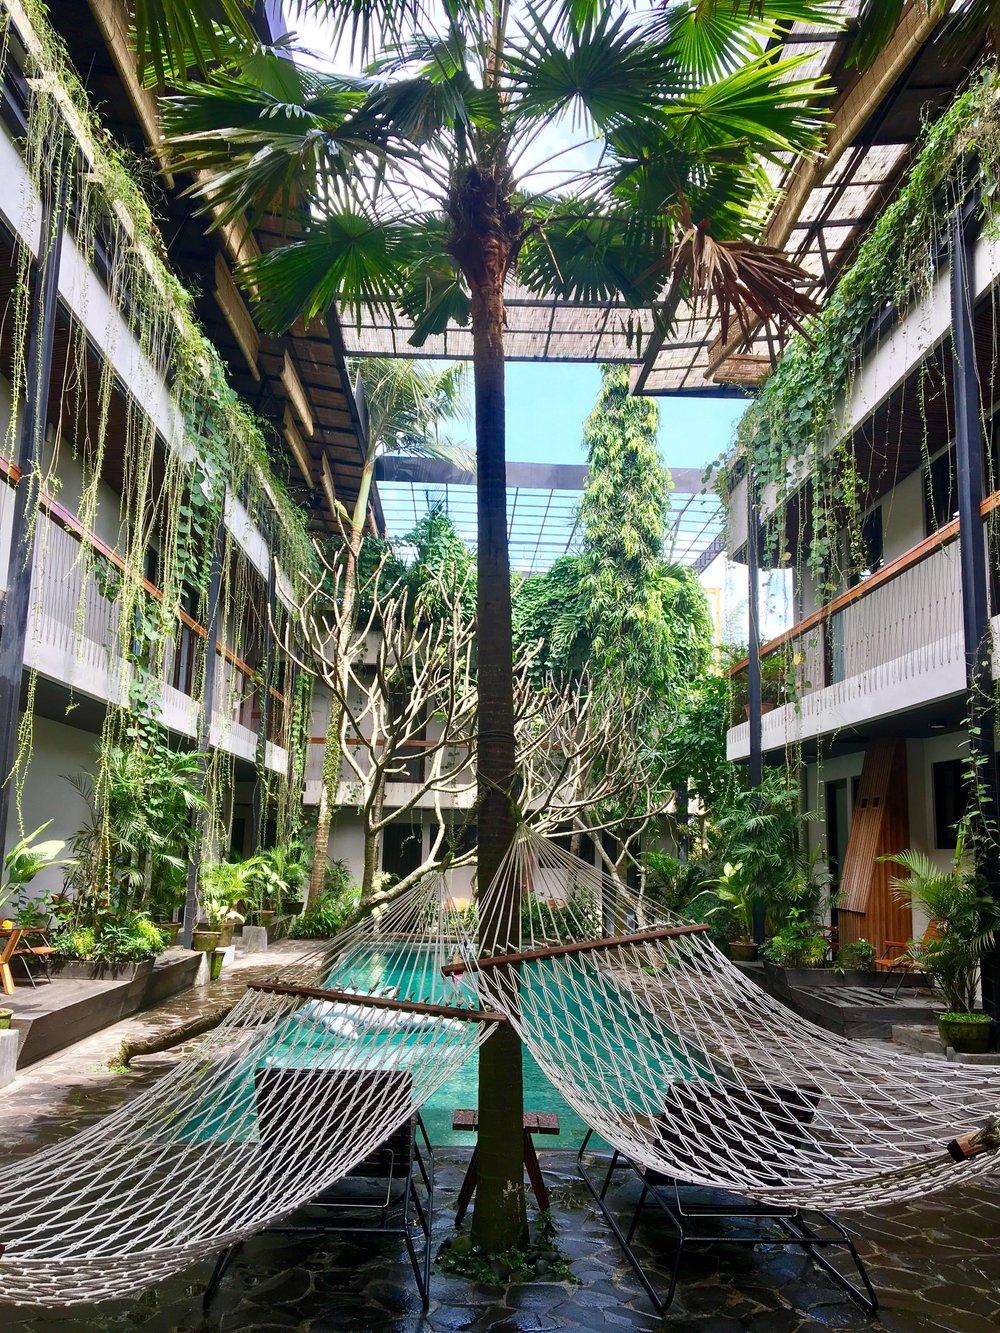 Roam, Ubud, Bali